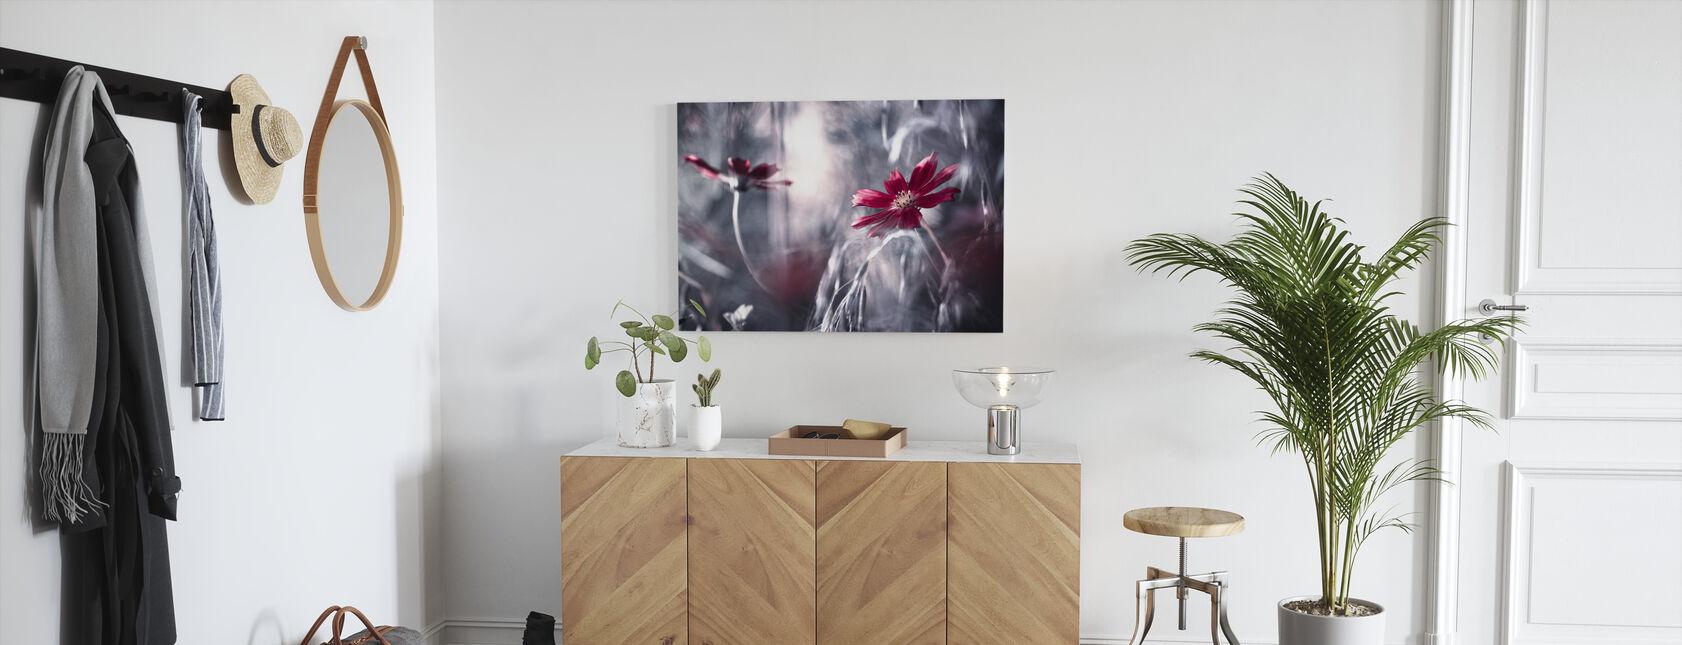 Seduction Games - Canvas print - Hallway